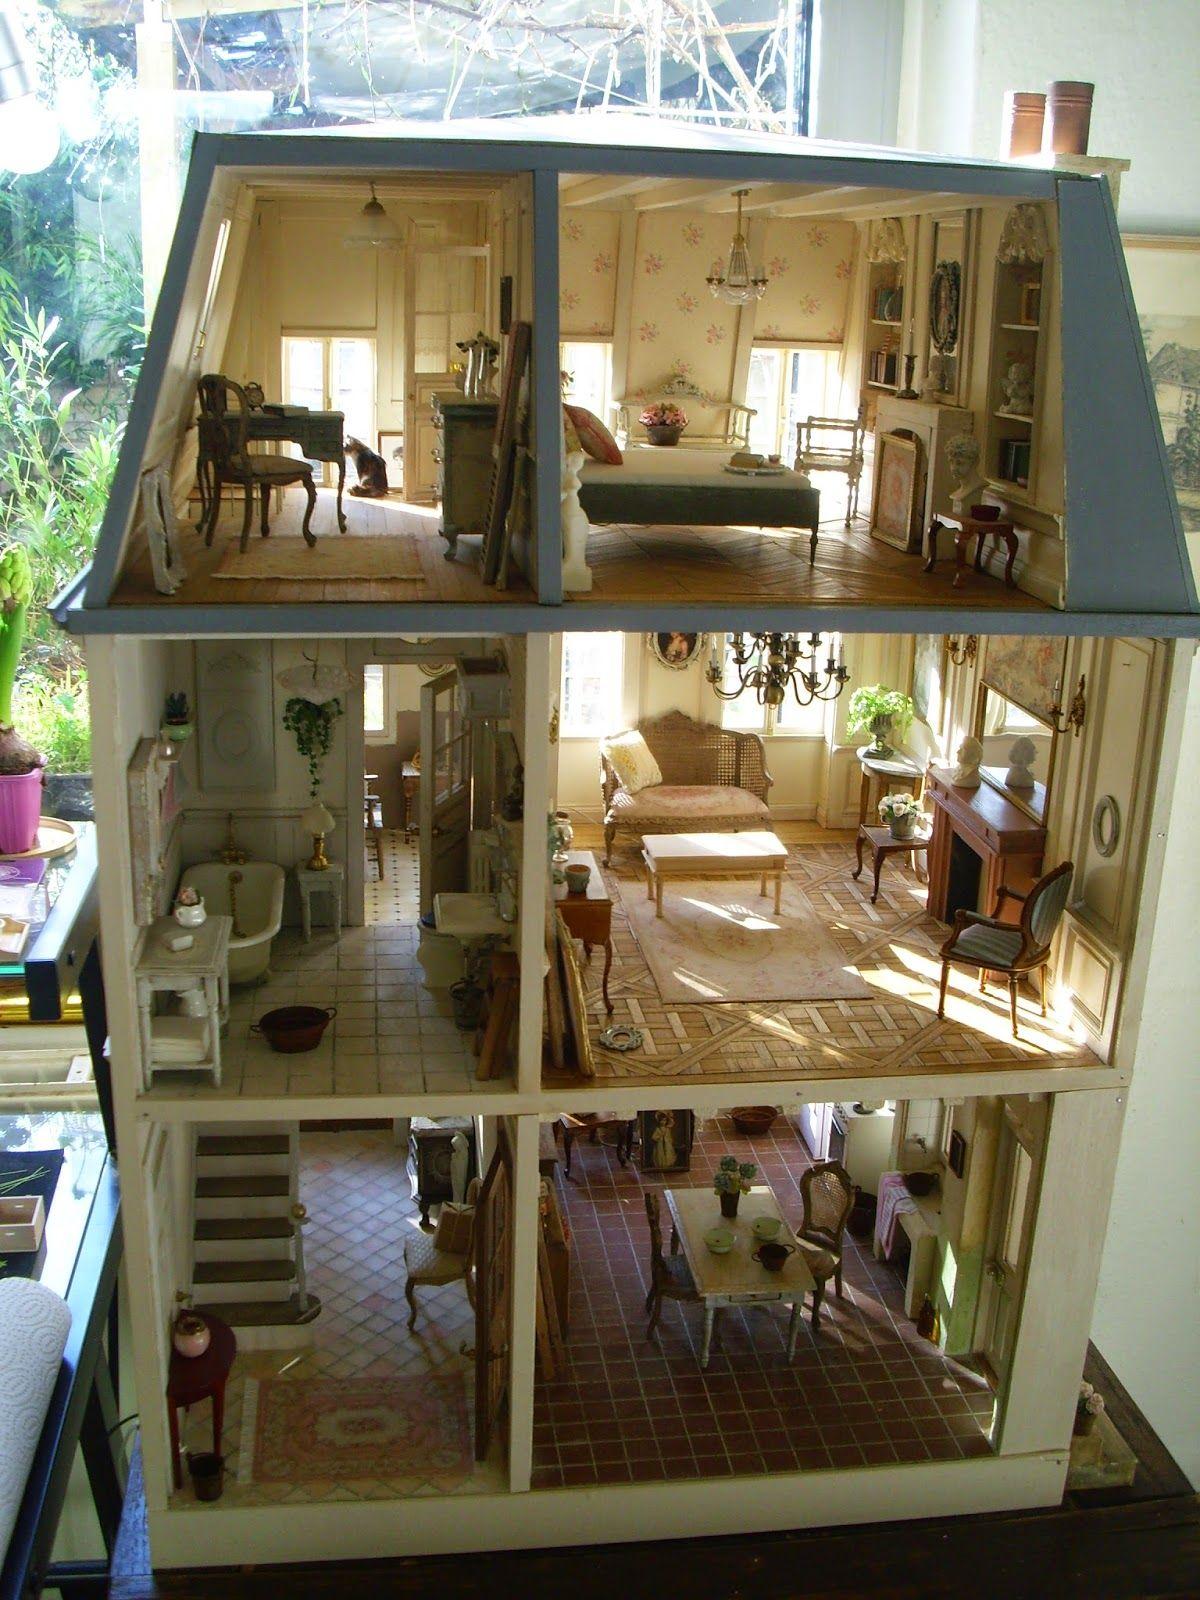 le grand livre de la maison miniature the big book of a. Black Bedroom Furniture Sets. Home Design Ideas